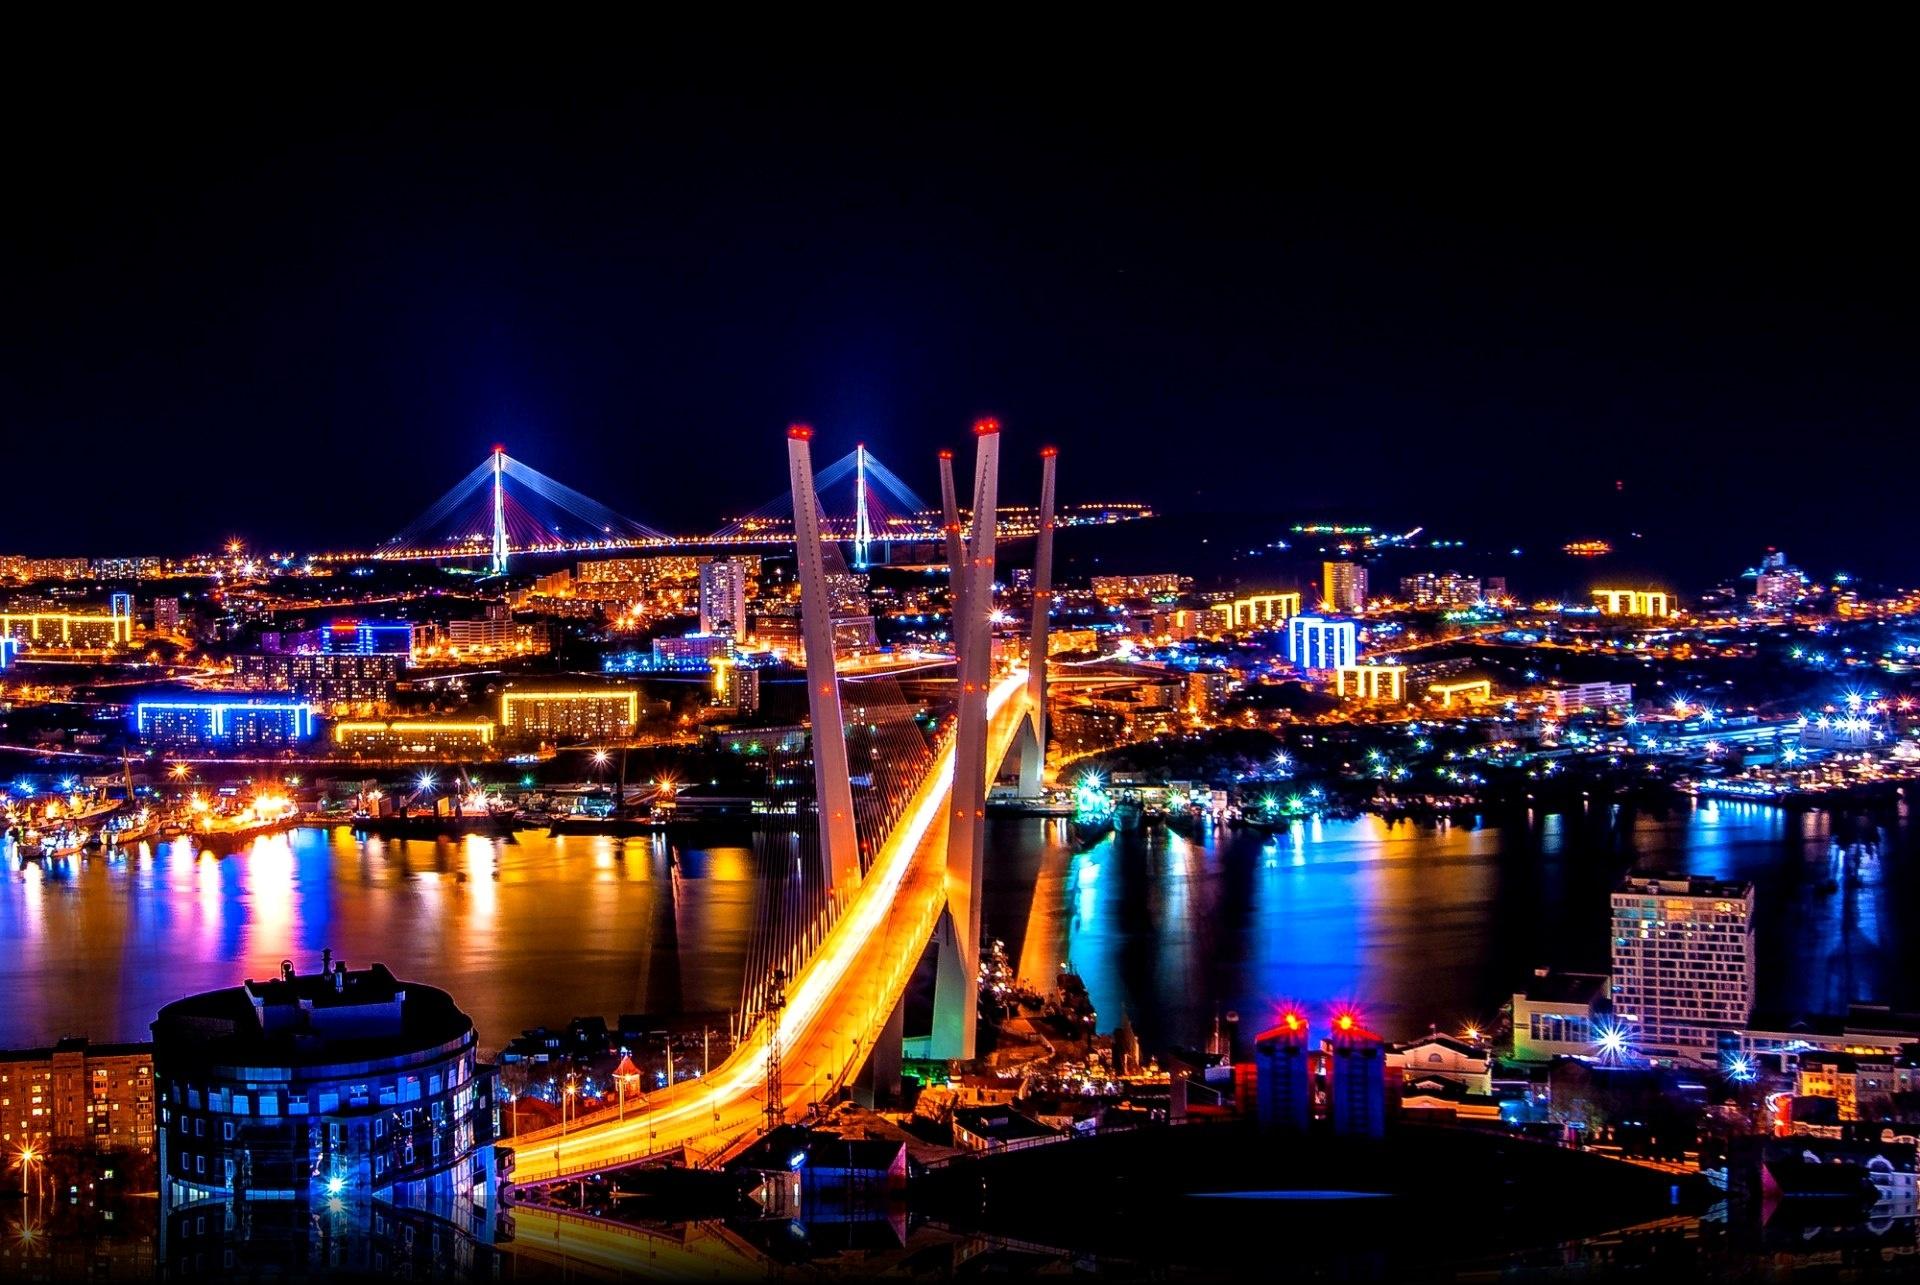 Vladivostok by Martin Blum